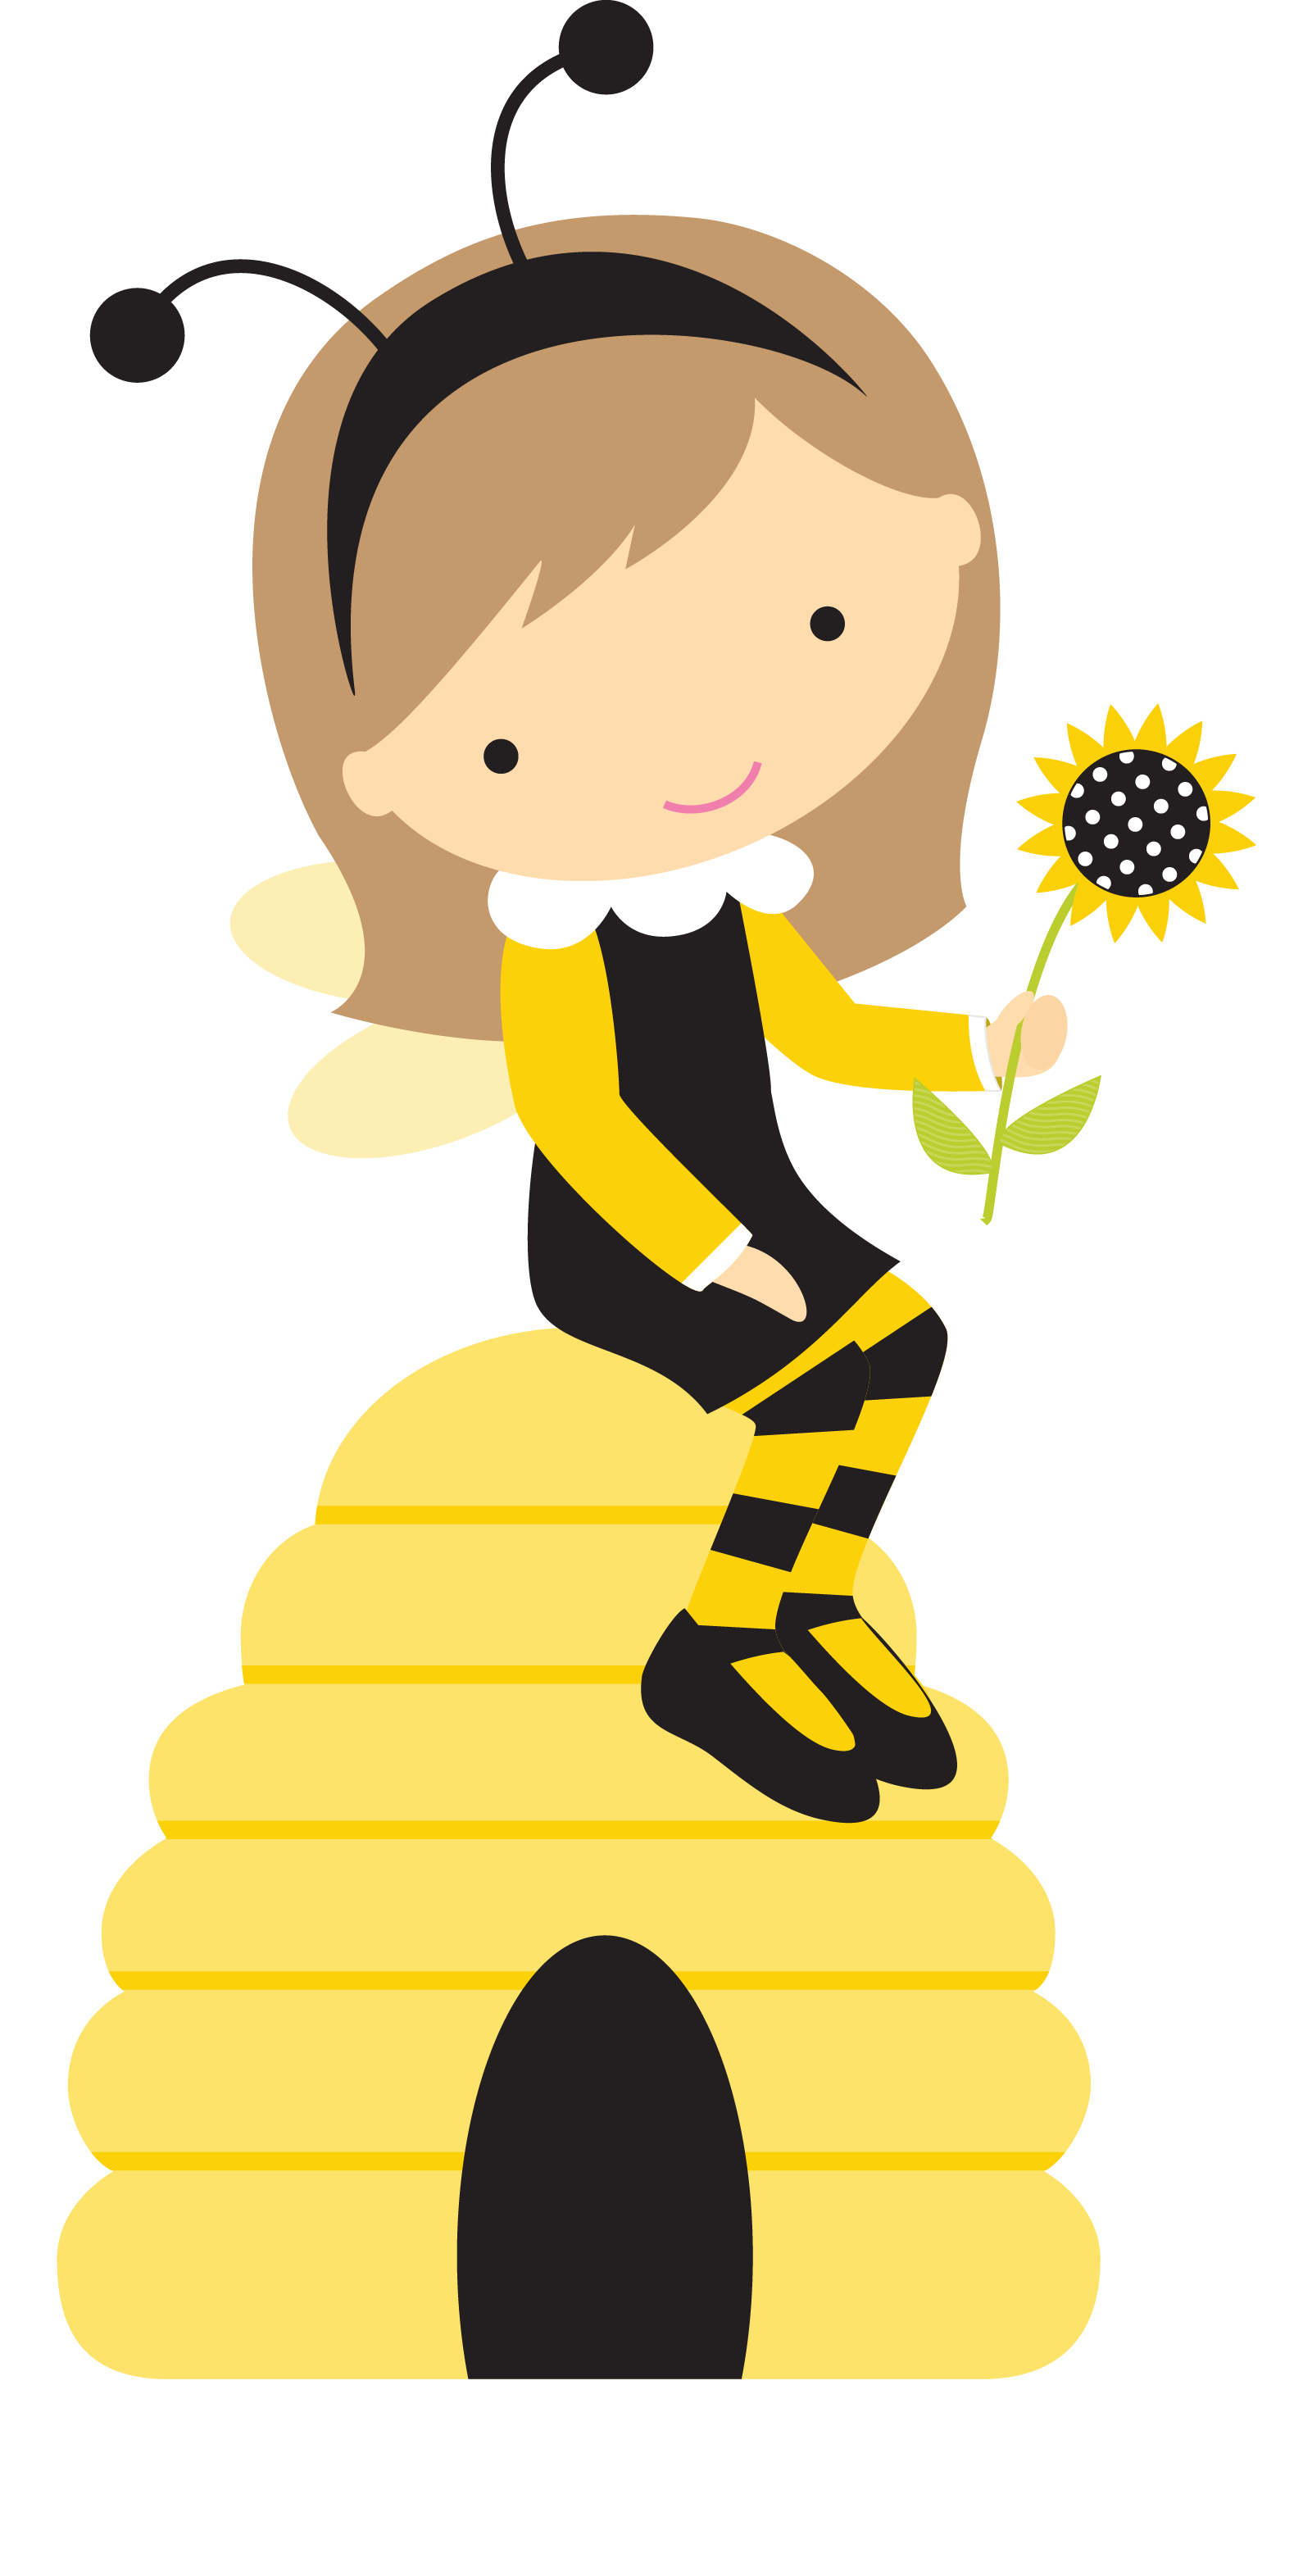 clip freeuse stock Bumble clipart girly. Imagens da abelhinha pinterest